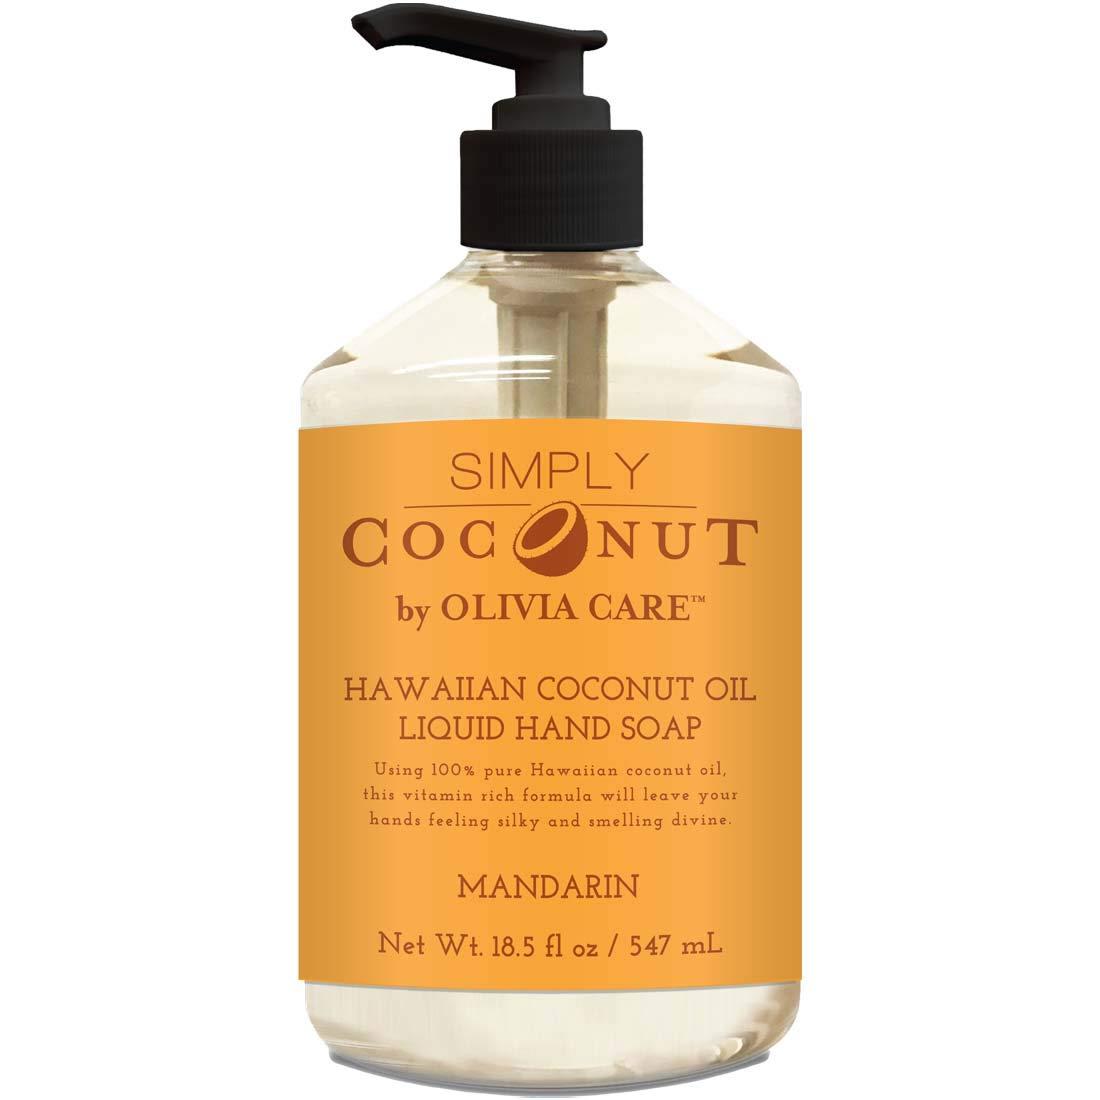 Indianapolis Mall 40% OFF Cheap Sale Liquid Hand Soap By Olivia Care All Coconut. - Mandarin Natura